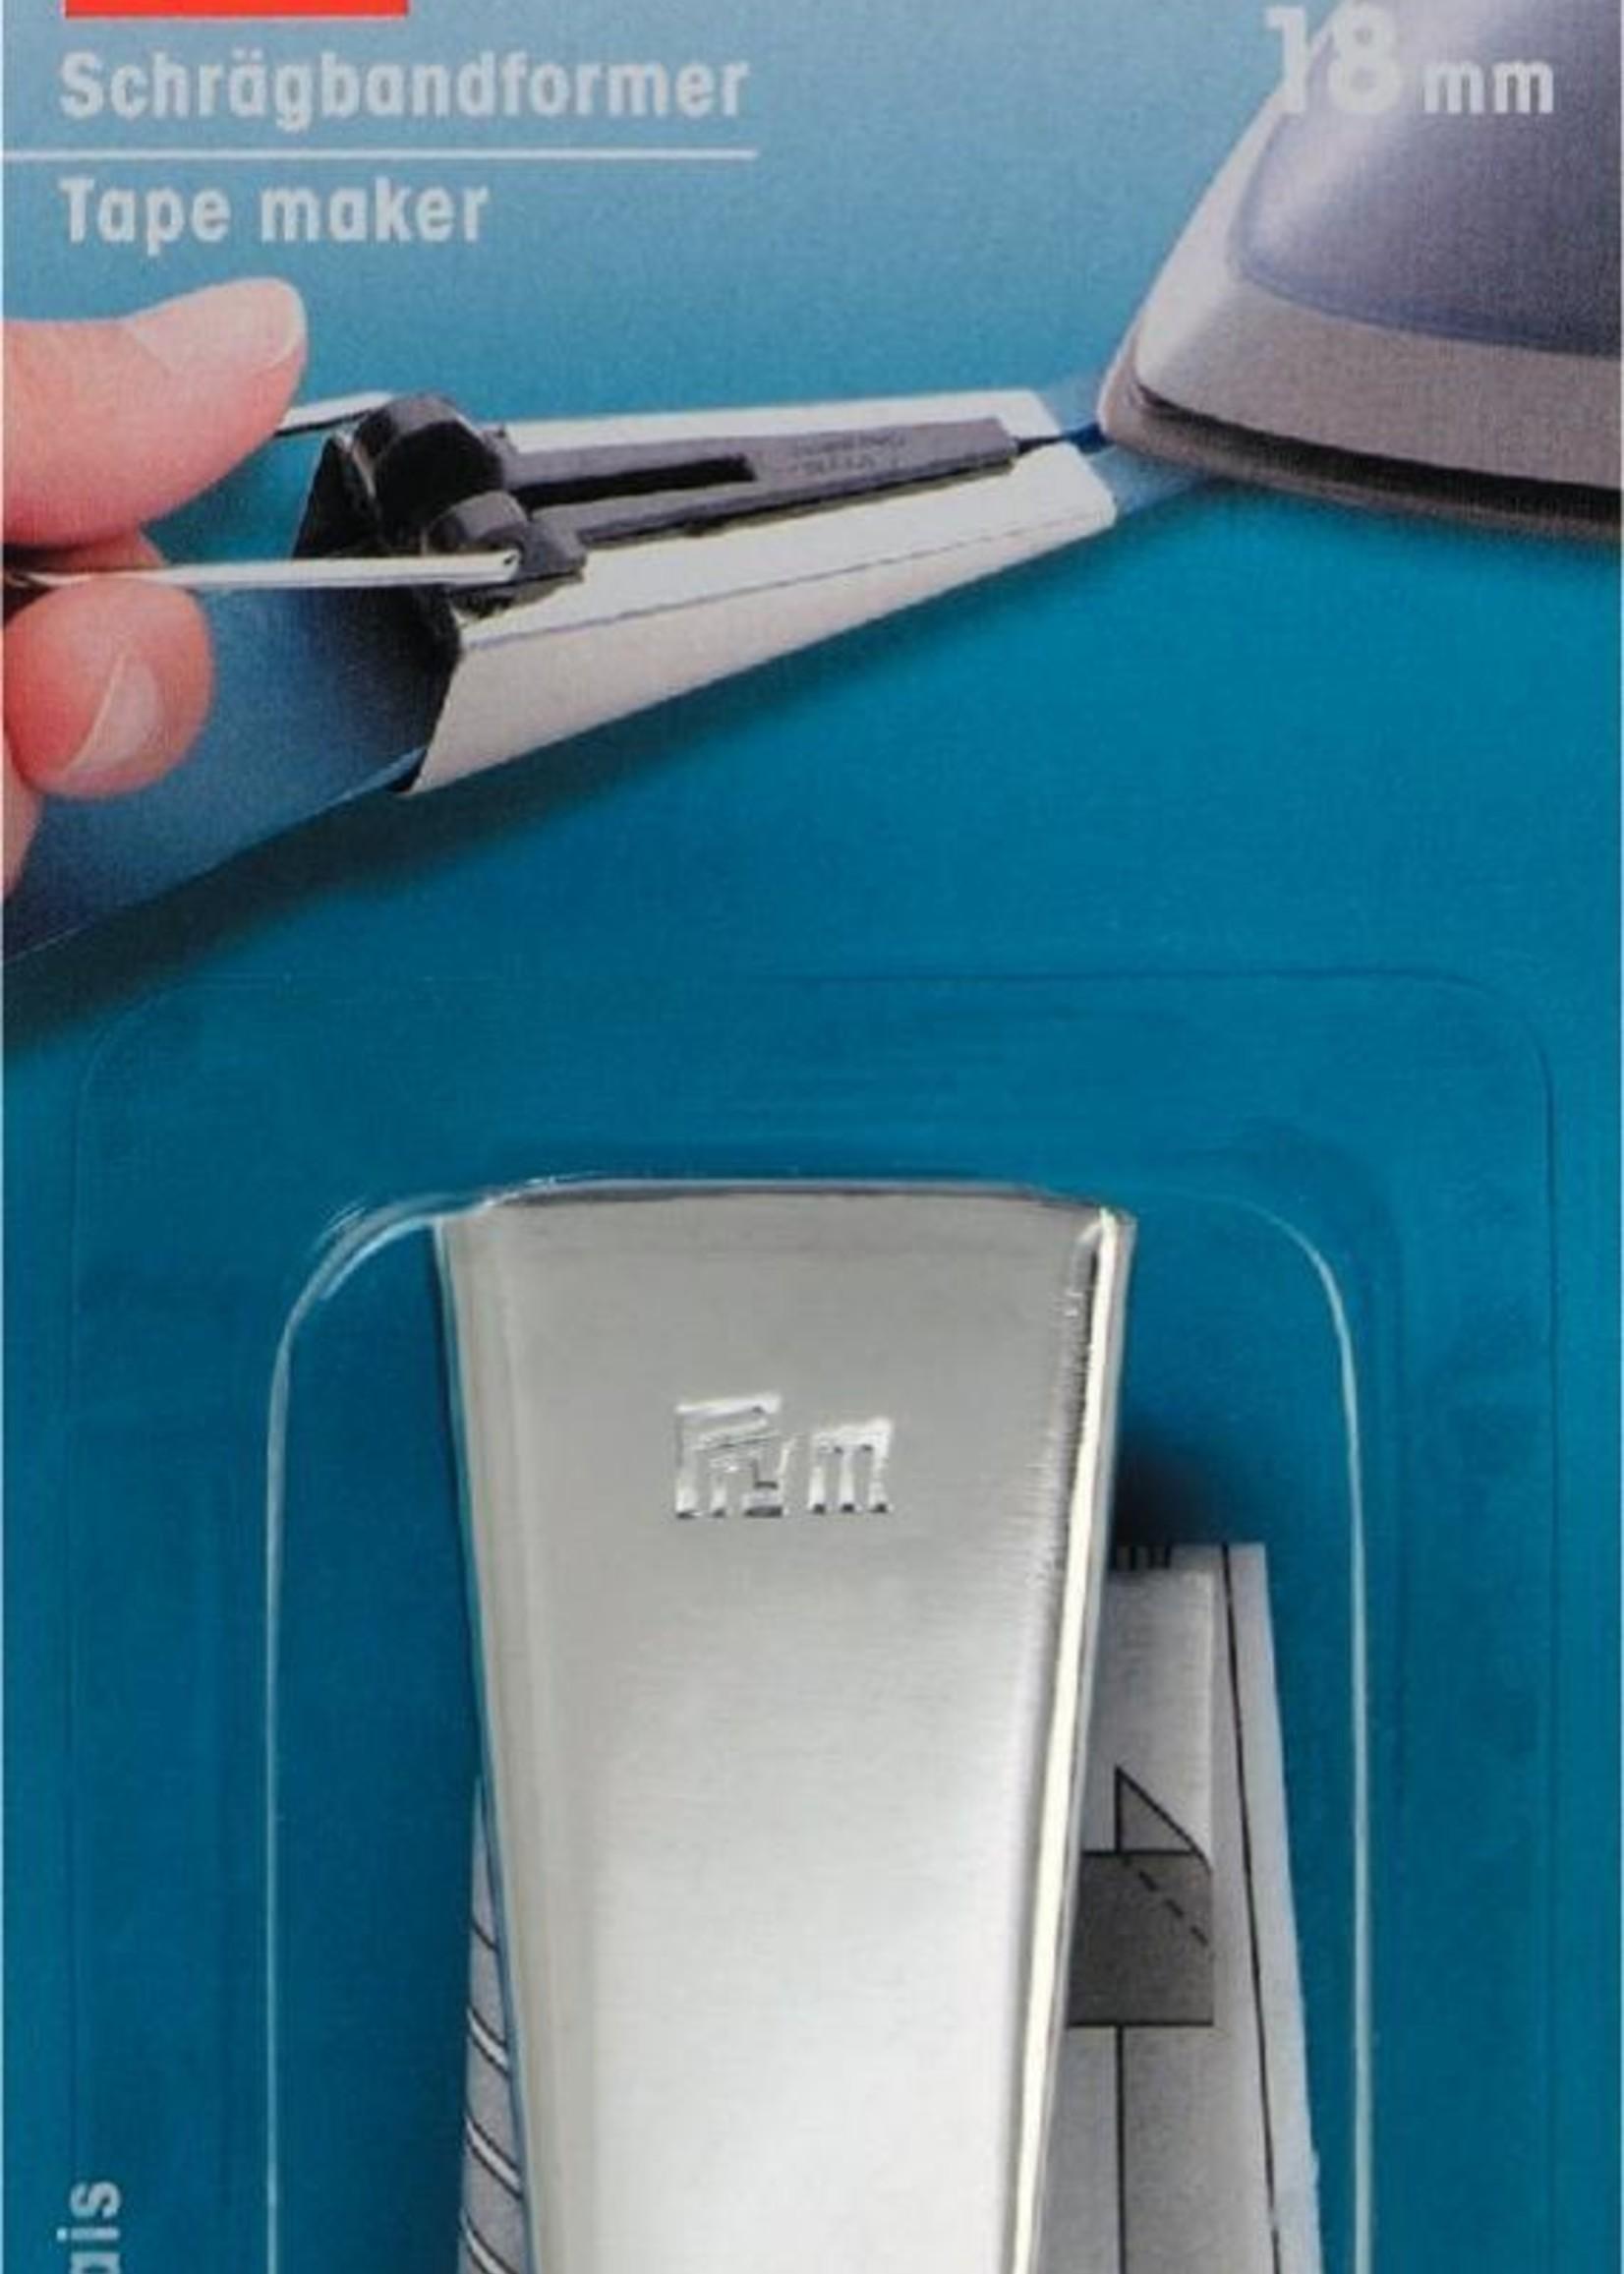 Prym biasband maker 18mm